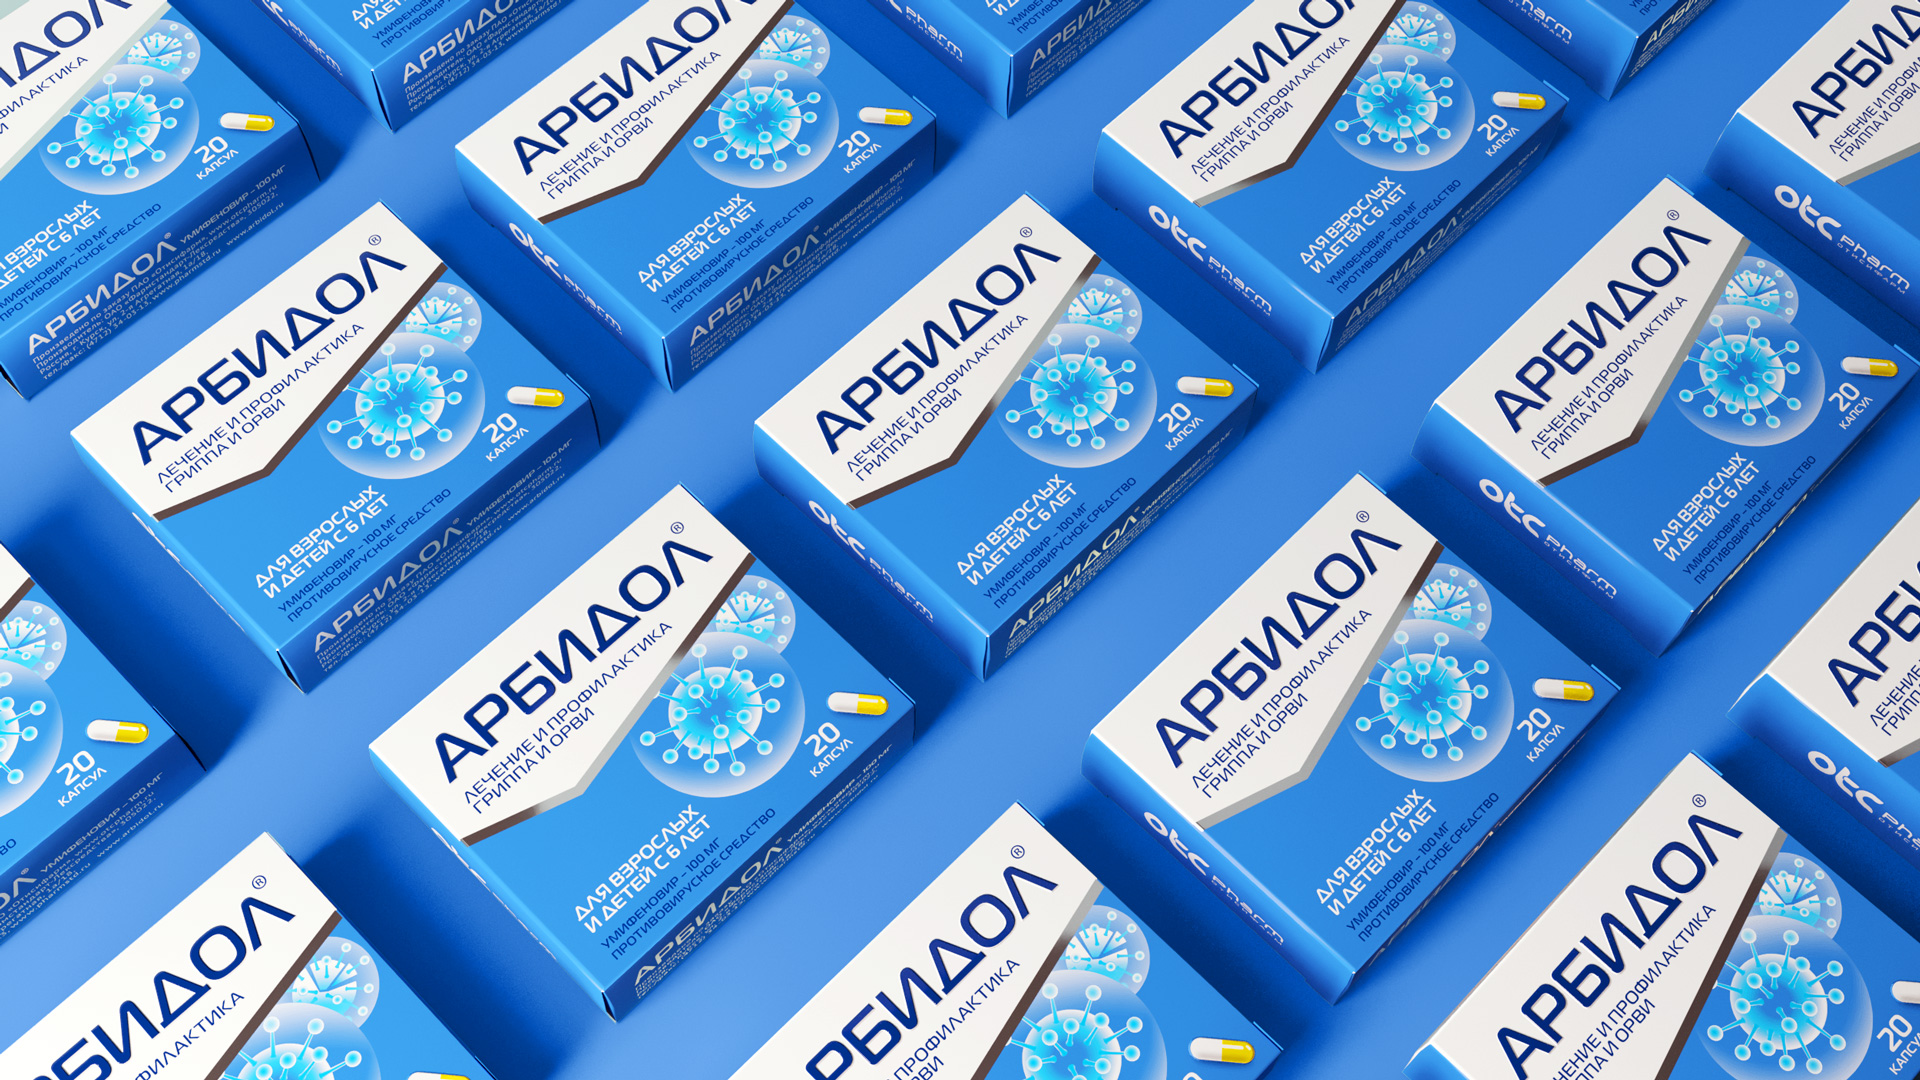 Asgard Create the Rebranding for Arbidol Medical Supplies